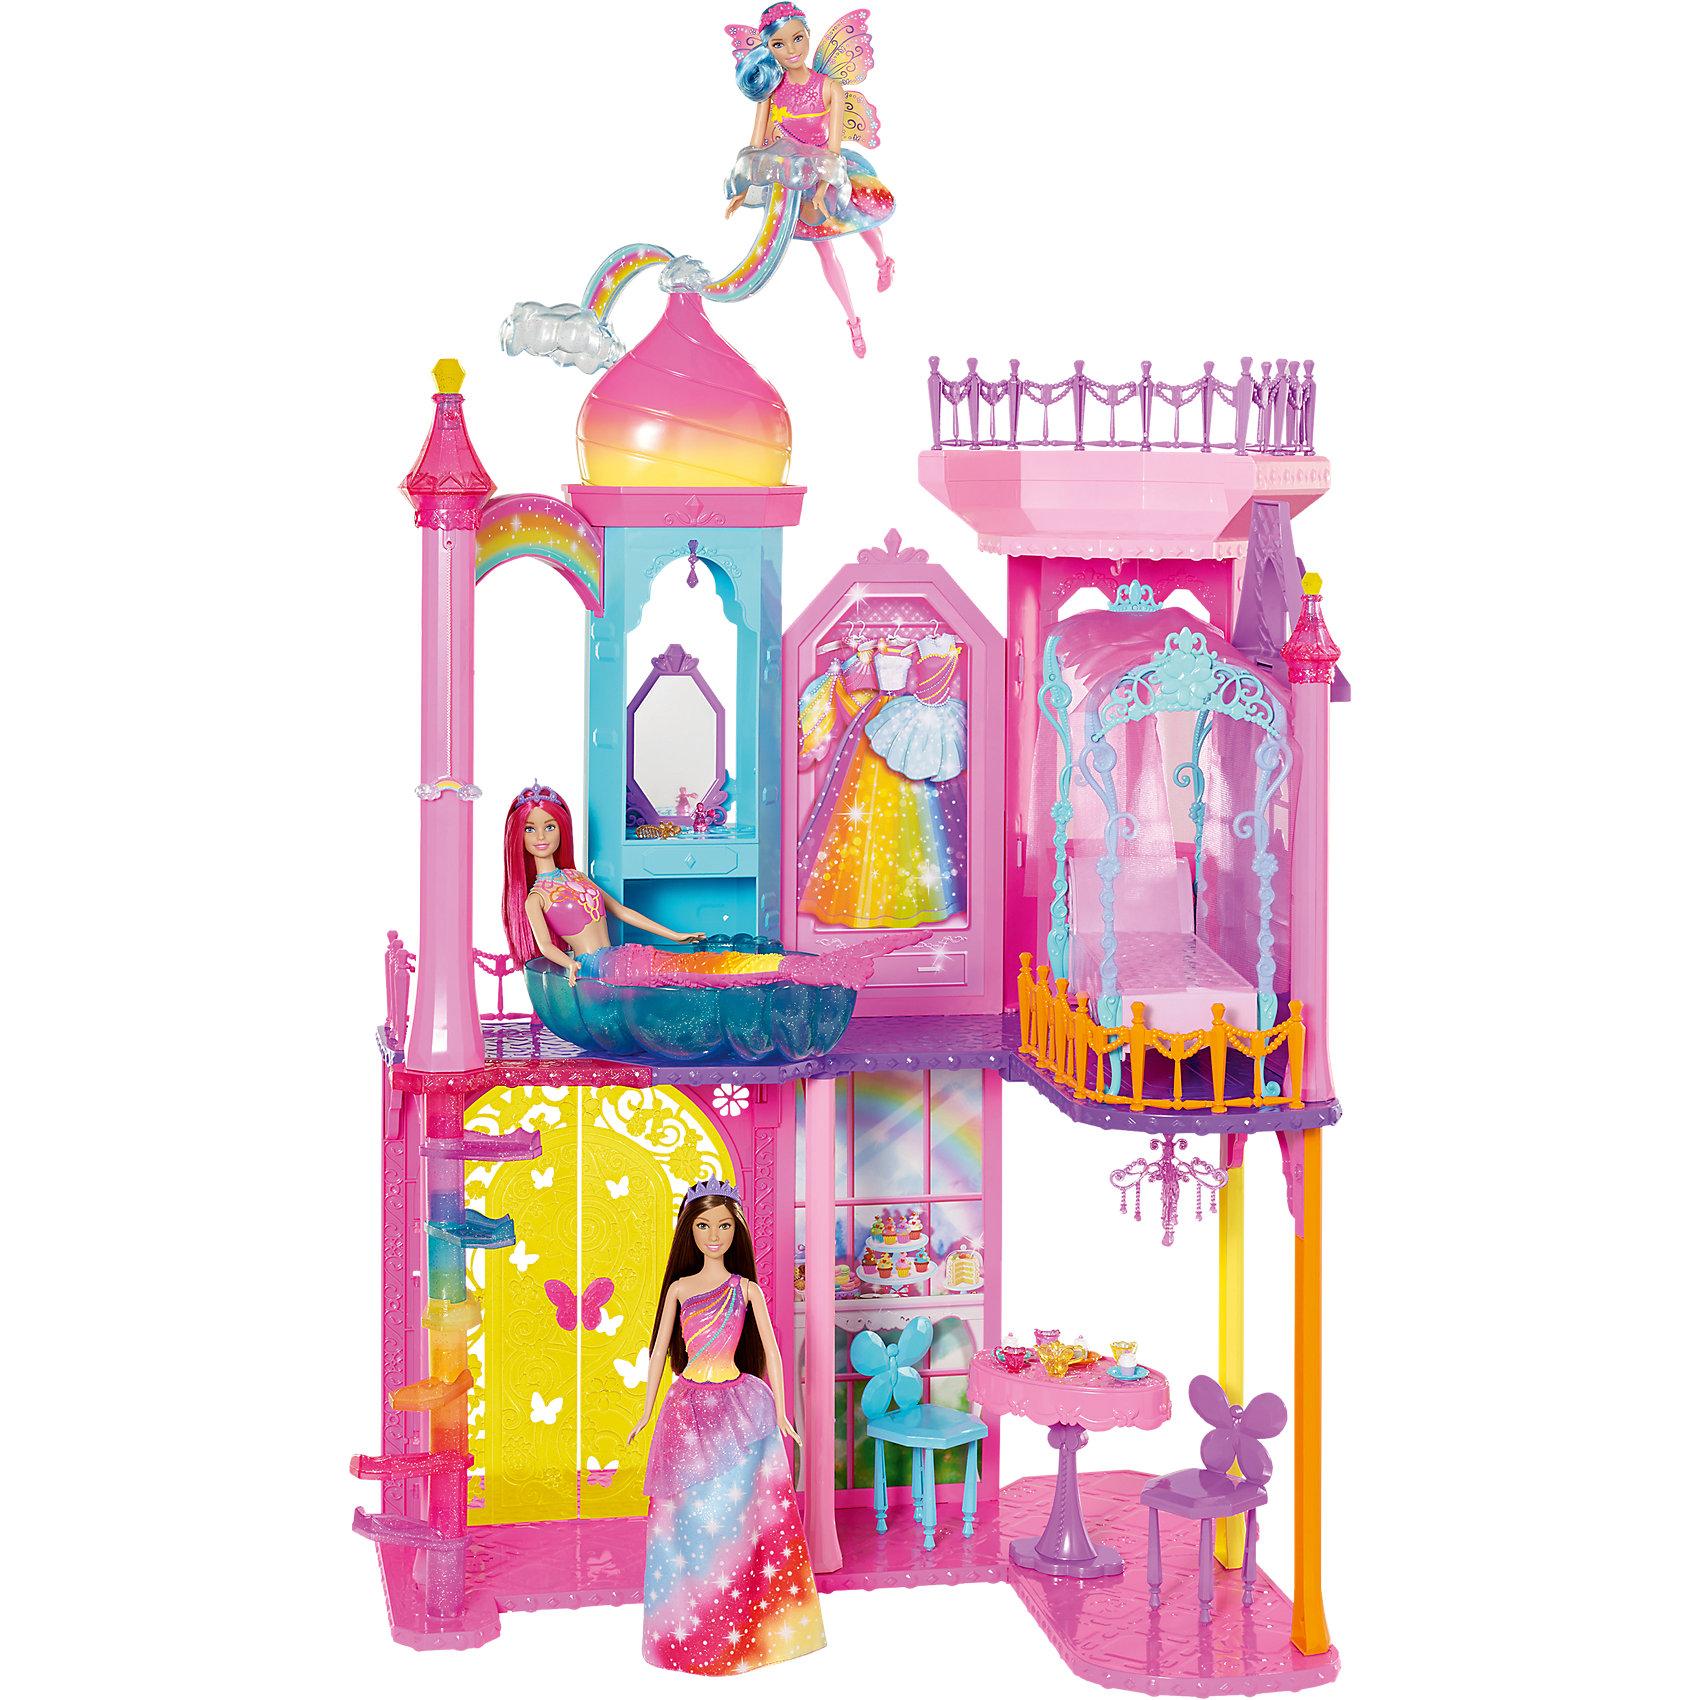 Mattel Радужный дворец Barbie mattel mattel кукла ever after high мишель мермейд